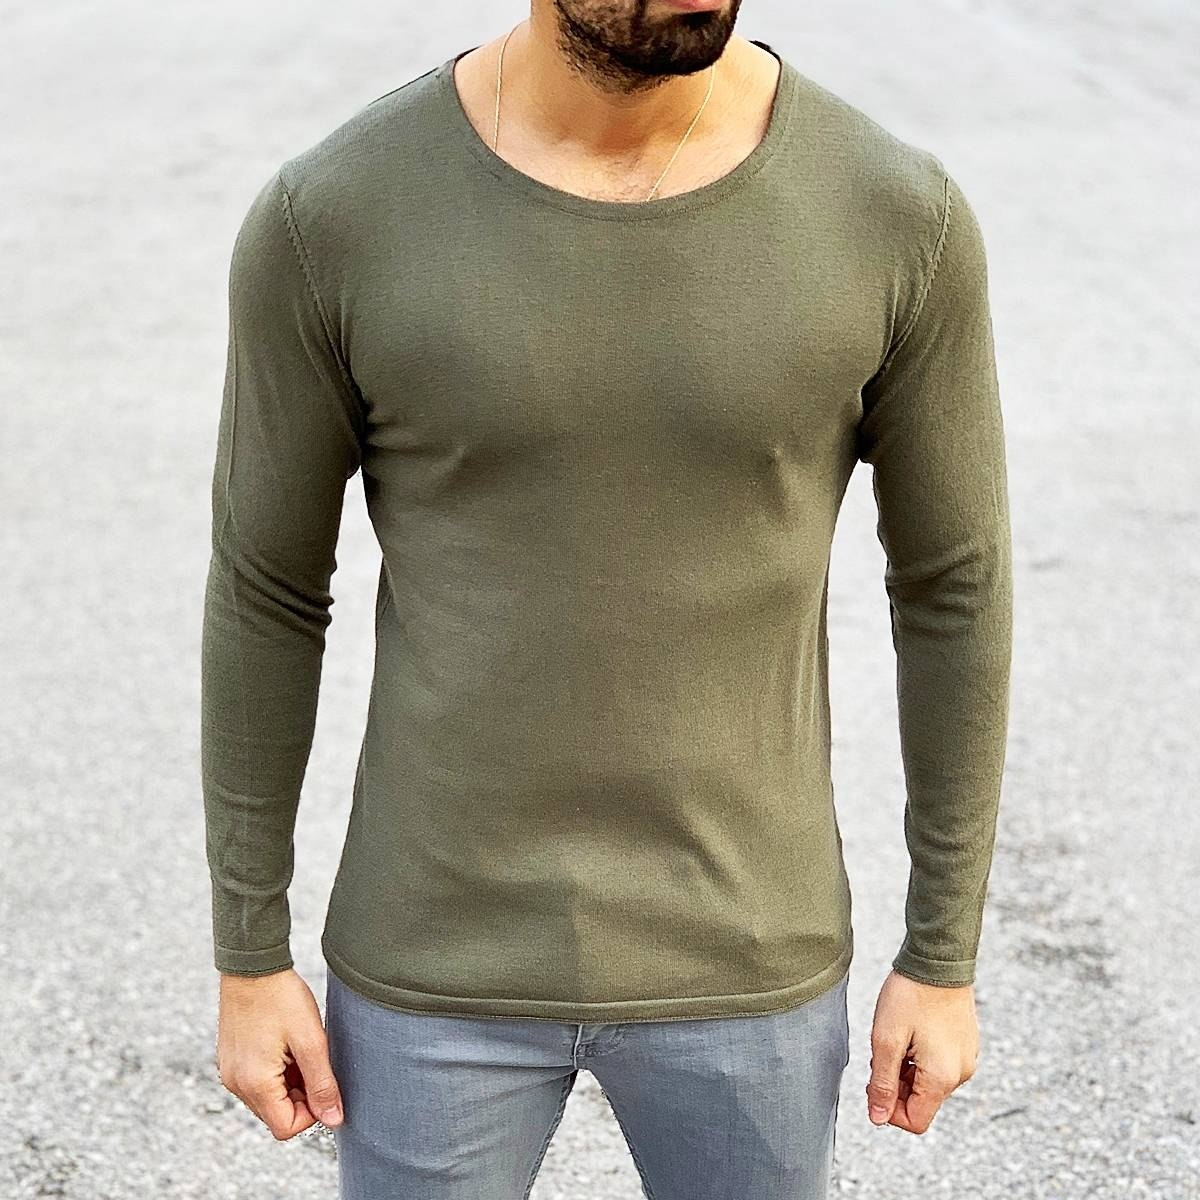 Men's Basic Spring Sweatshirt In Khaki Mv Premium Brand - 3